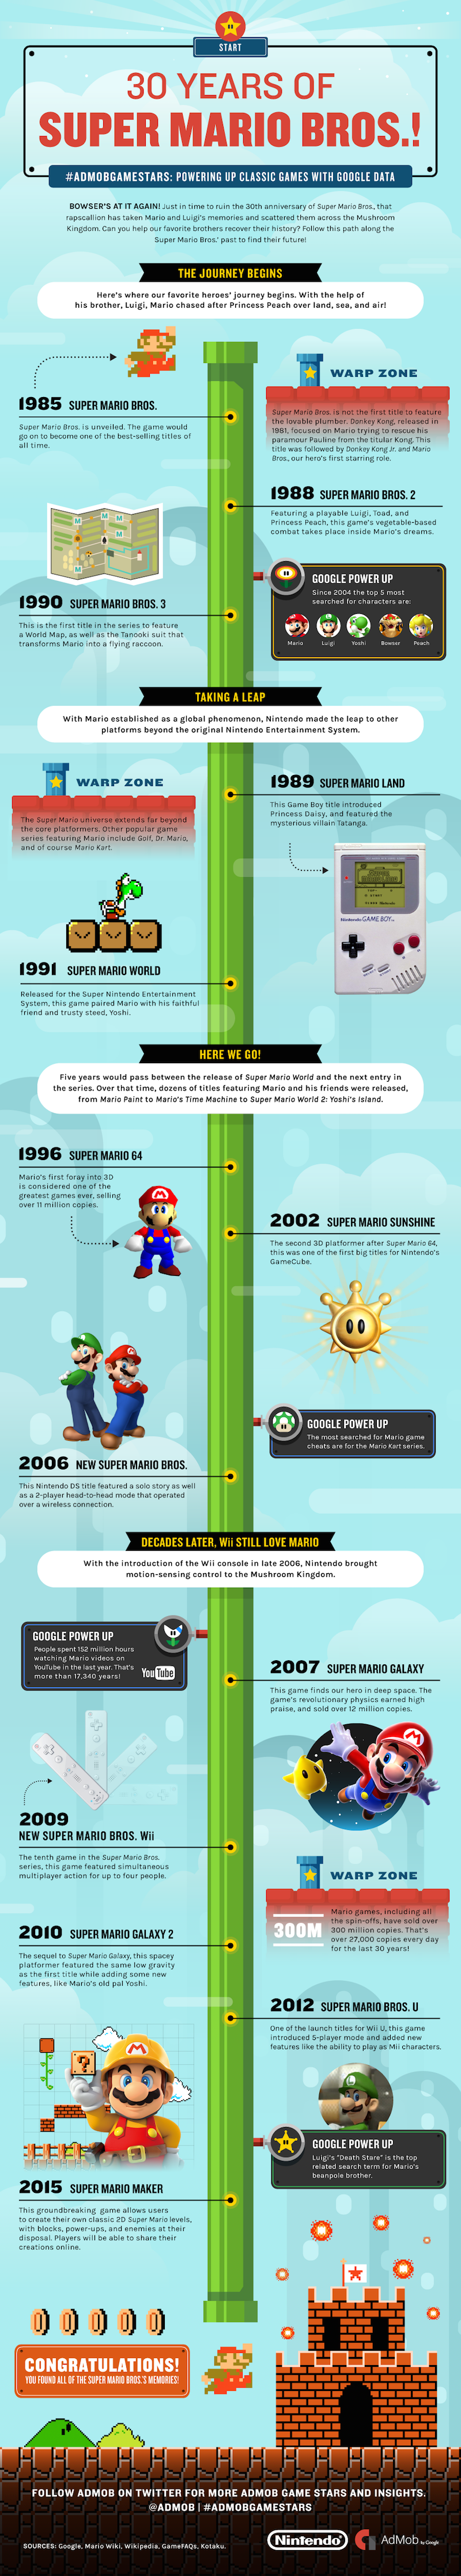 30-Years of Super Mario